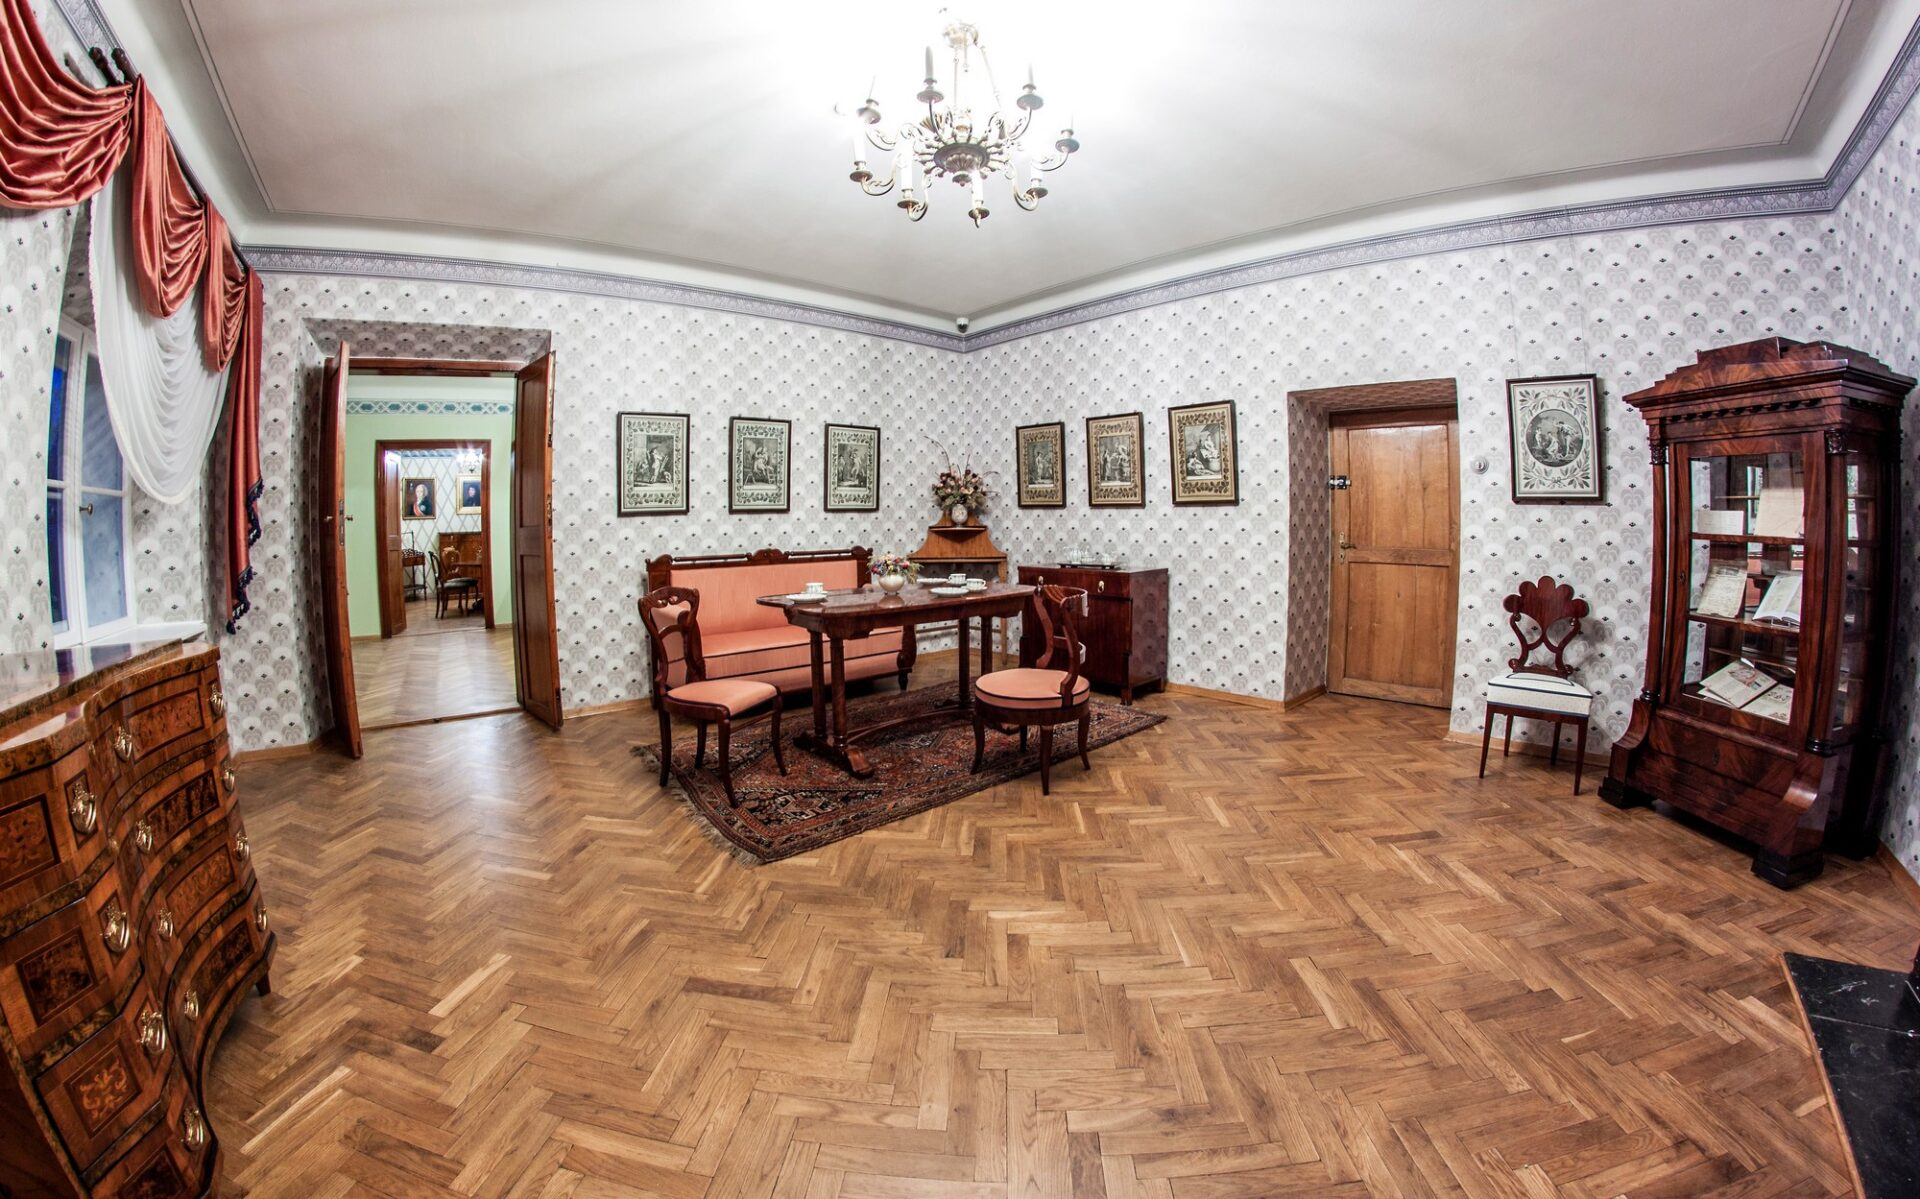 Fot. Muzeum w Jarosławiu Kamienica Orsettich